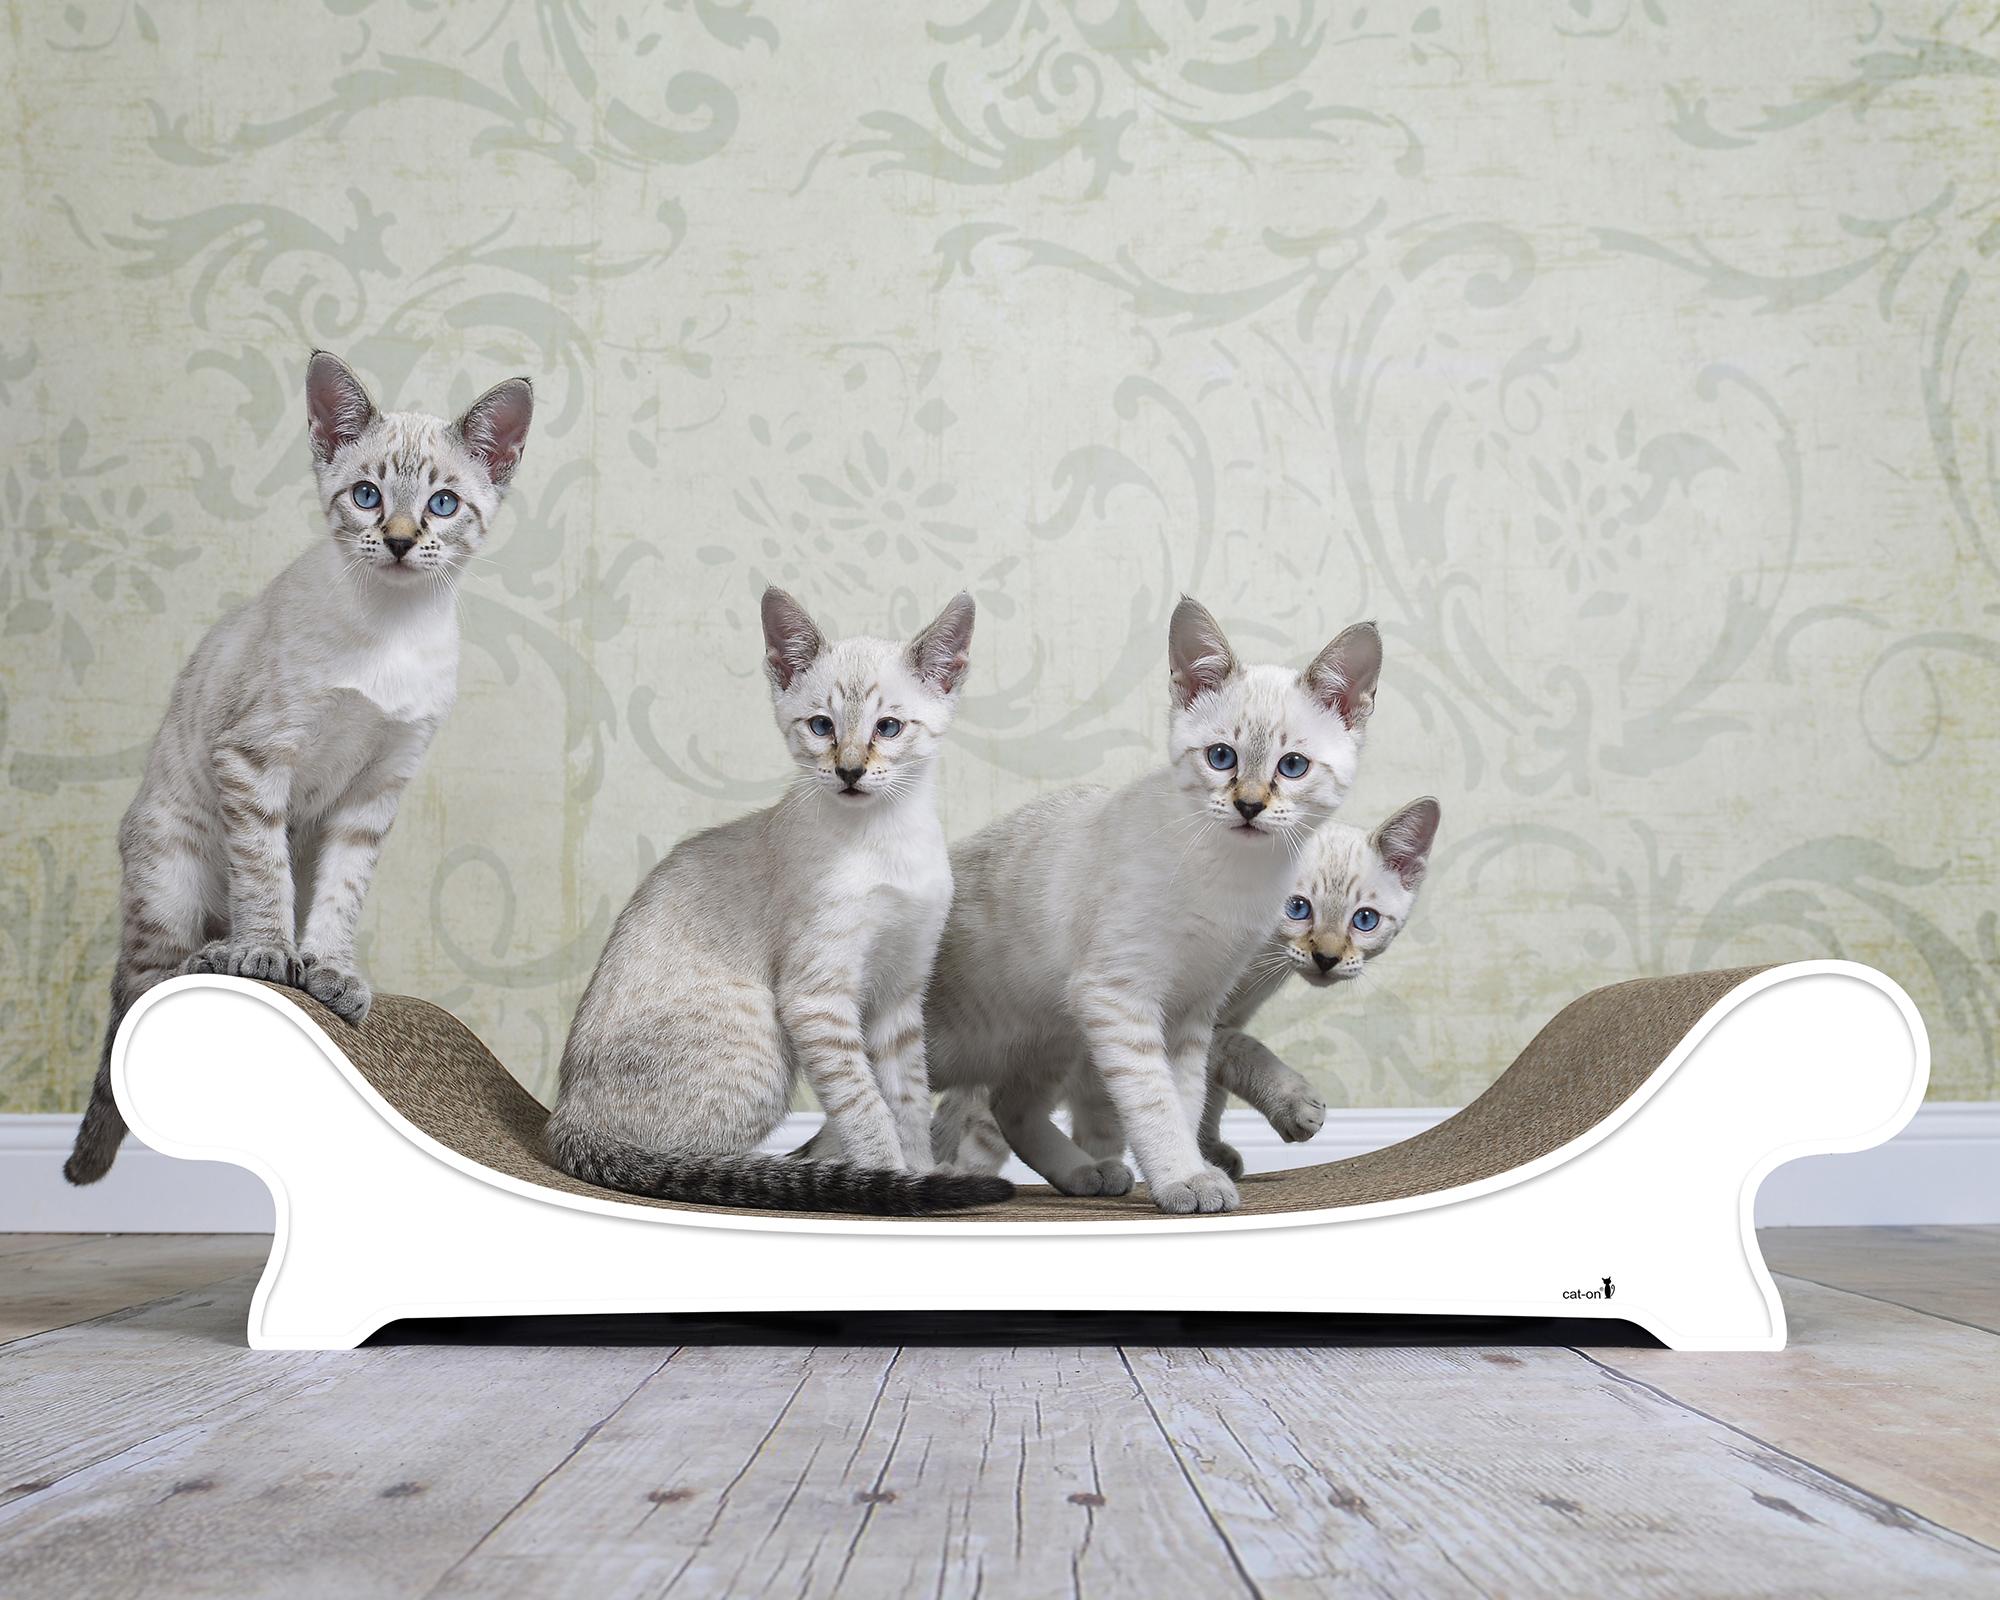 Weißes Kratzmöbel für Katzen Le Canapé - individuell angefertigt